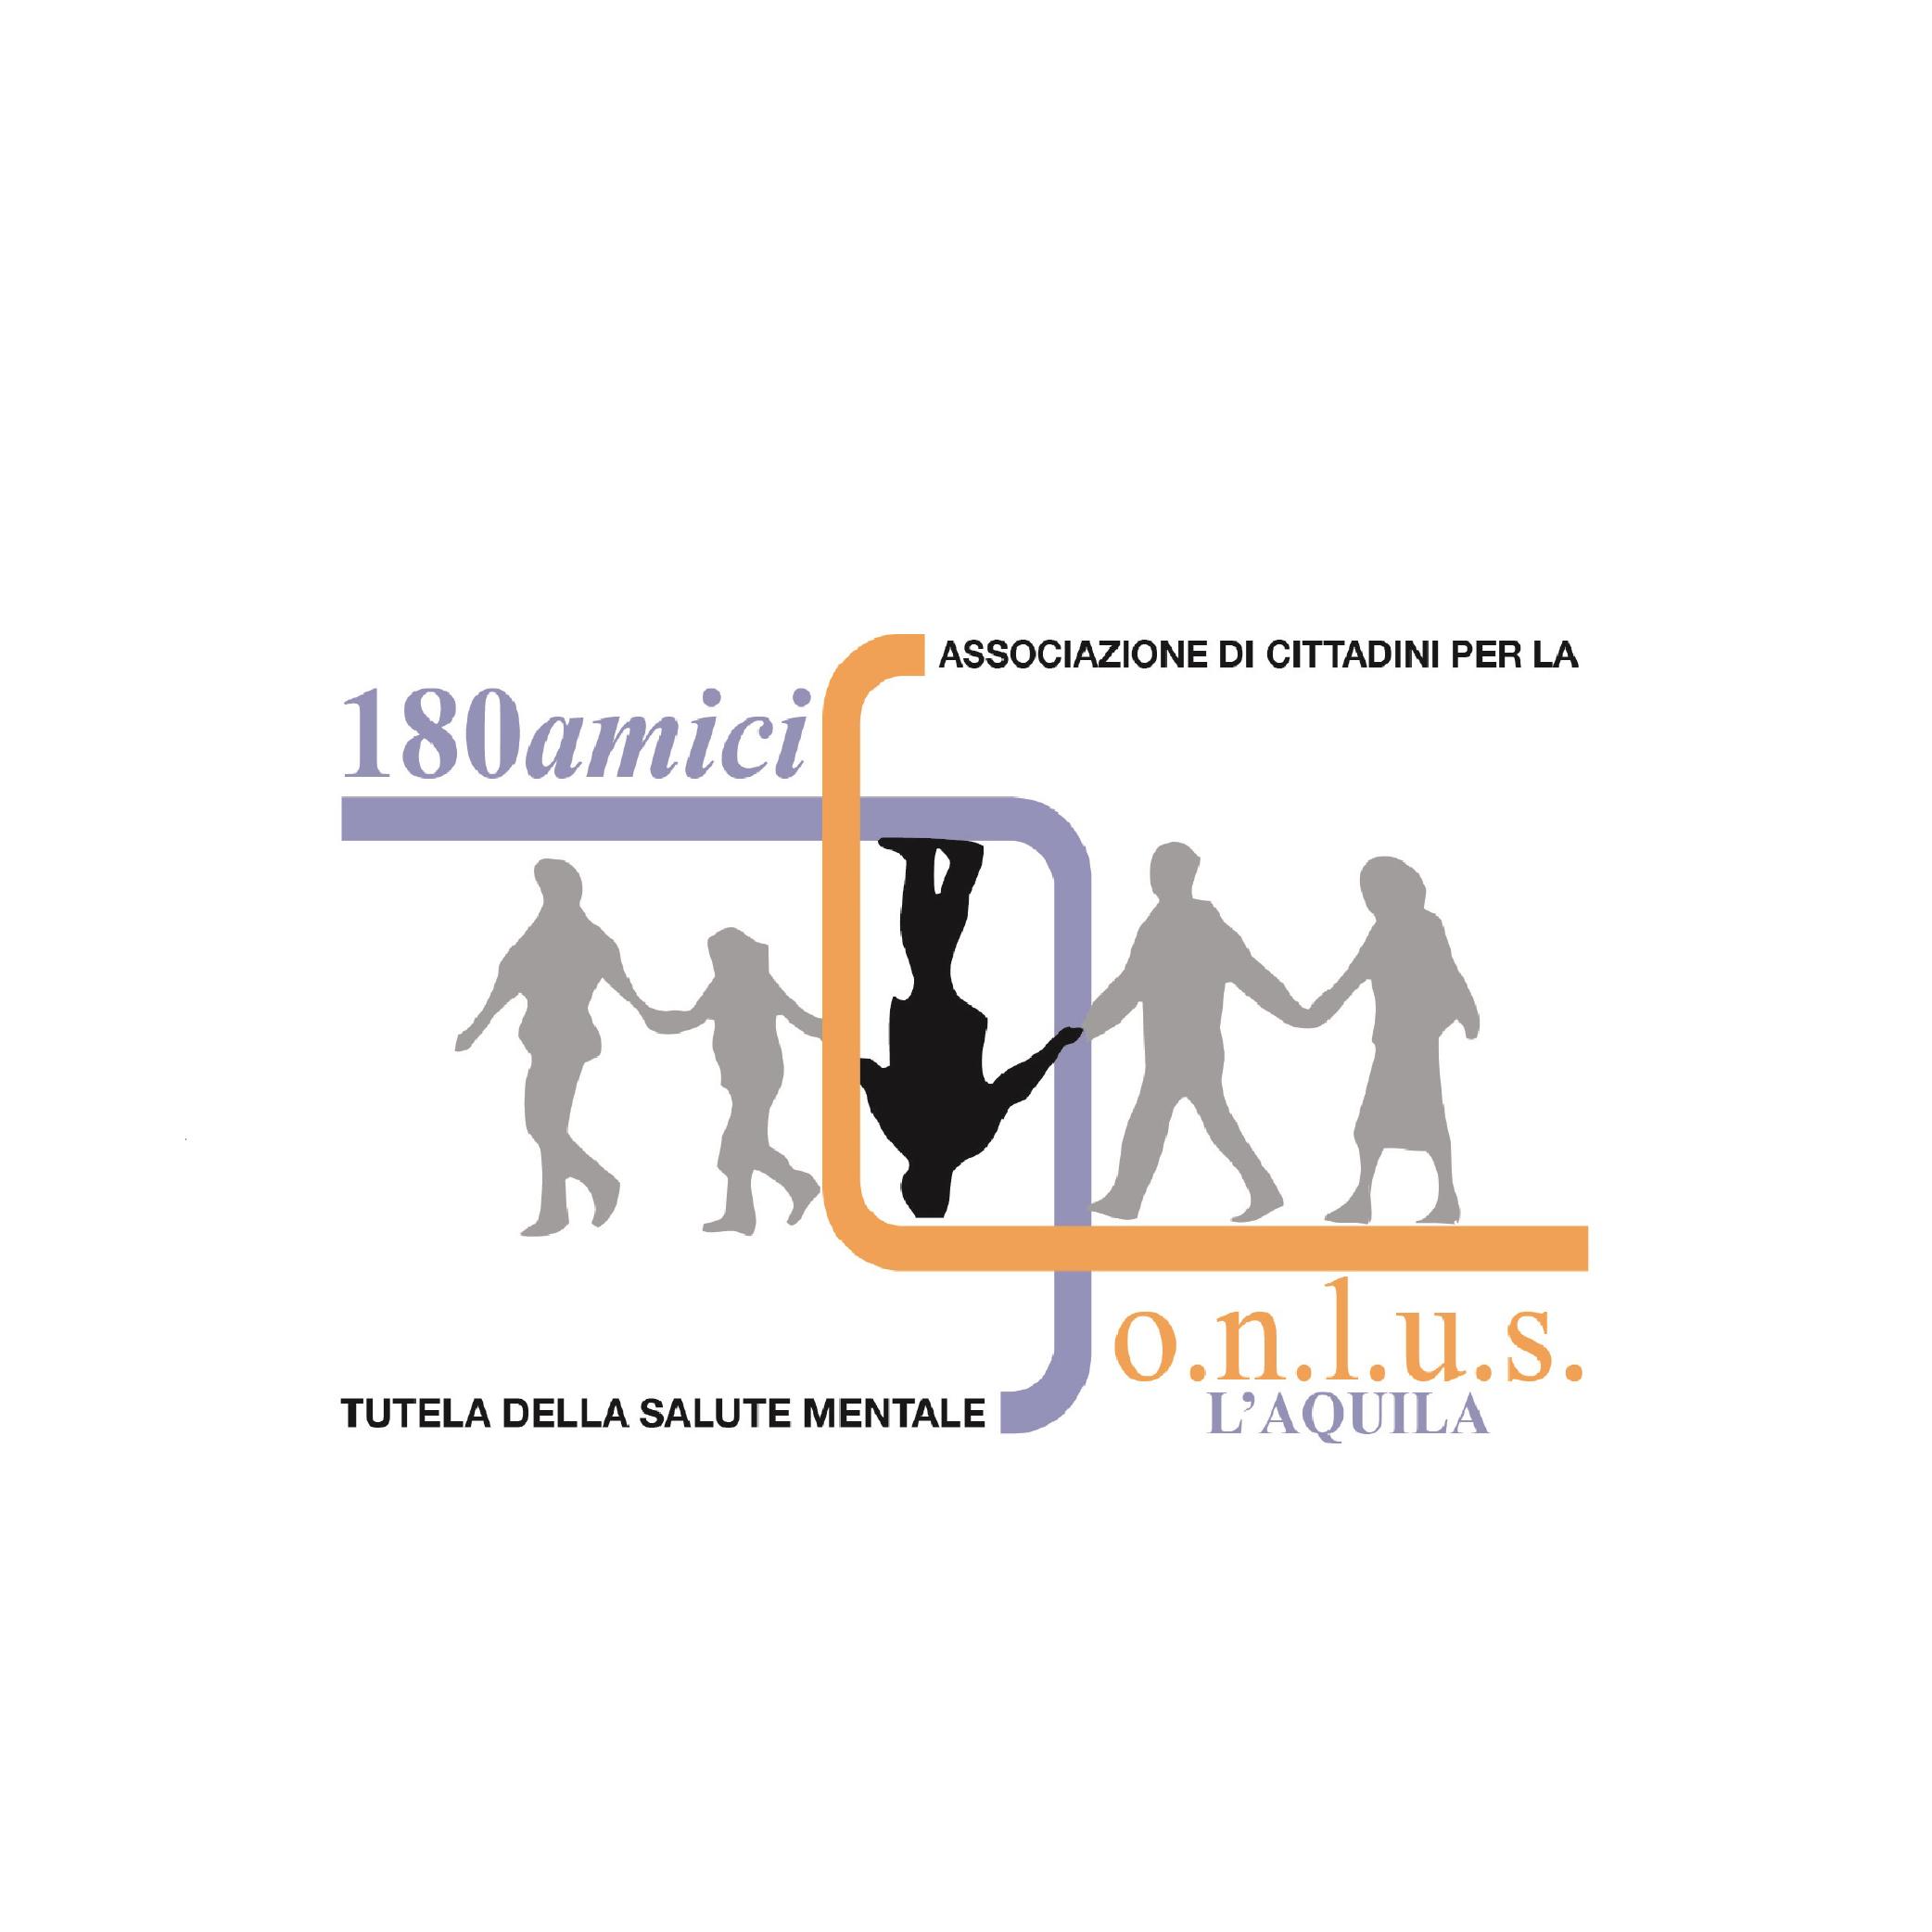 180amici L'Aquila